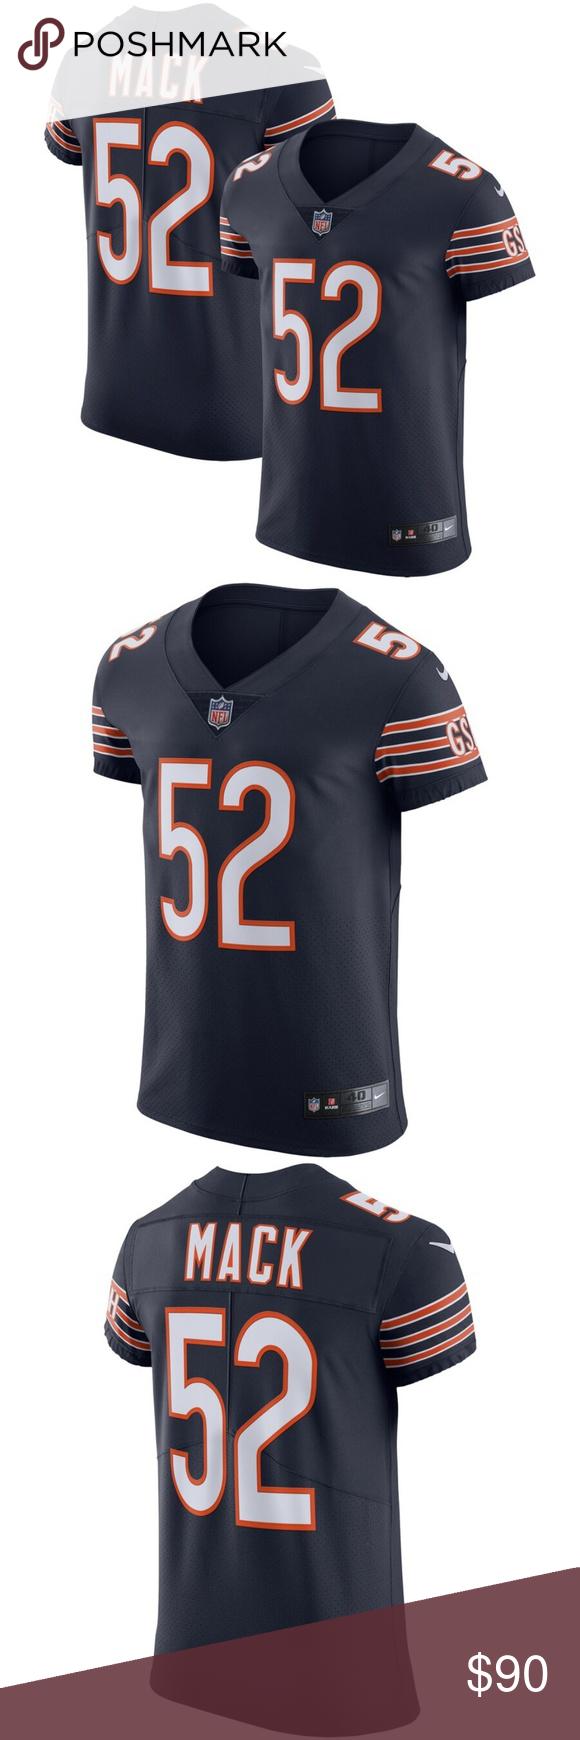 Men S Chicago Bears Khalil Mack Nike Navy Vapor El Get This Vapor Elite Jersey From Nike And Show Off Your Chicago Bears Spirit Chicago Bears Nfl Shirts Mack